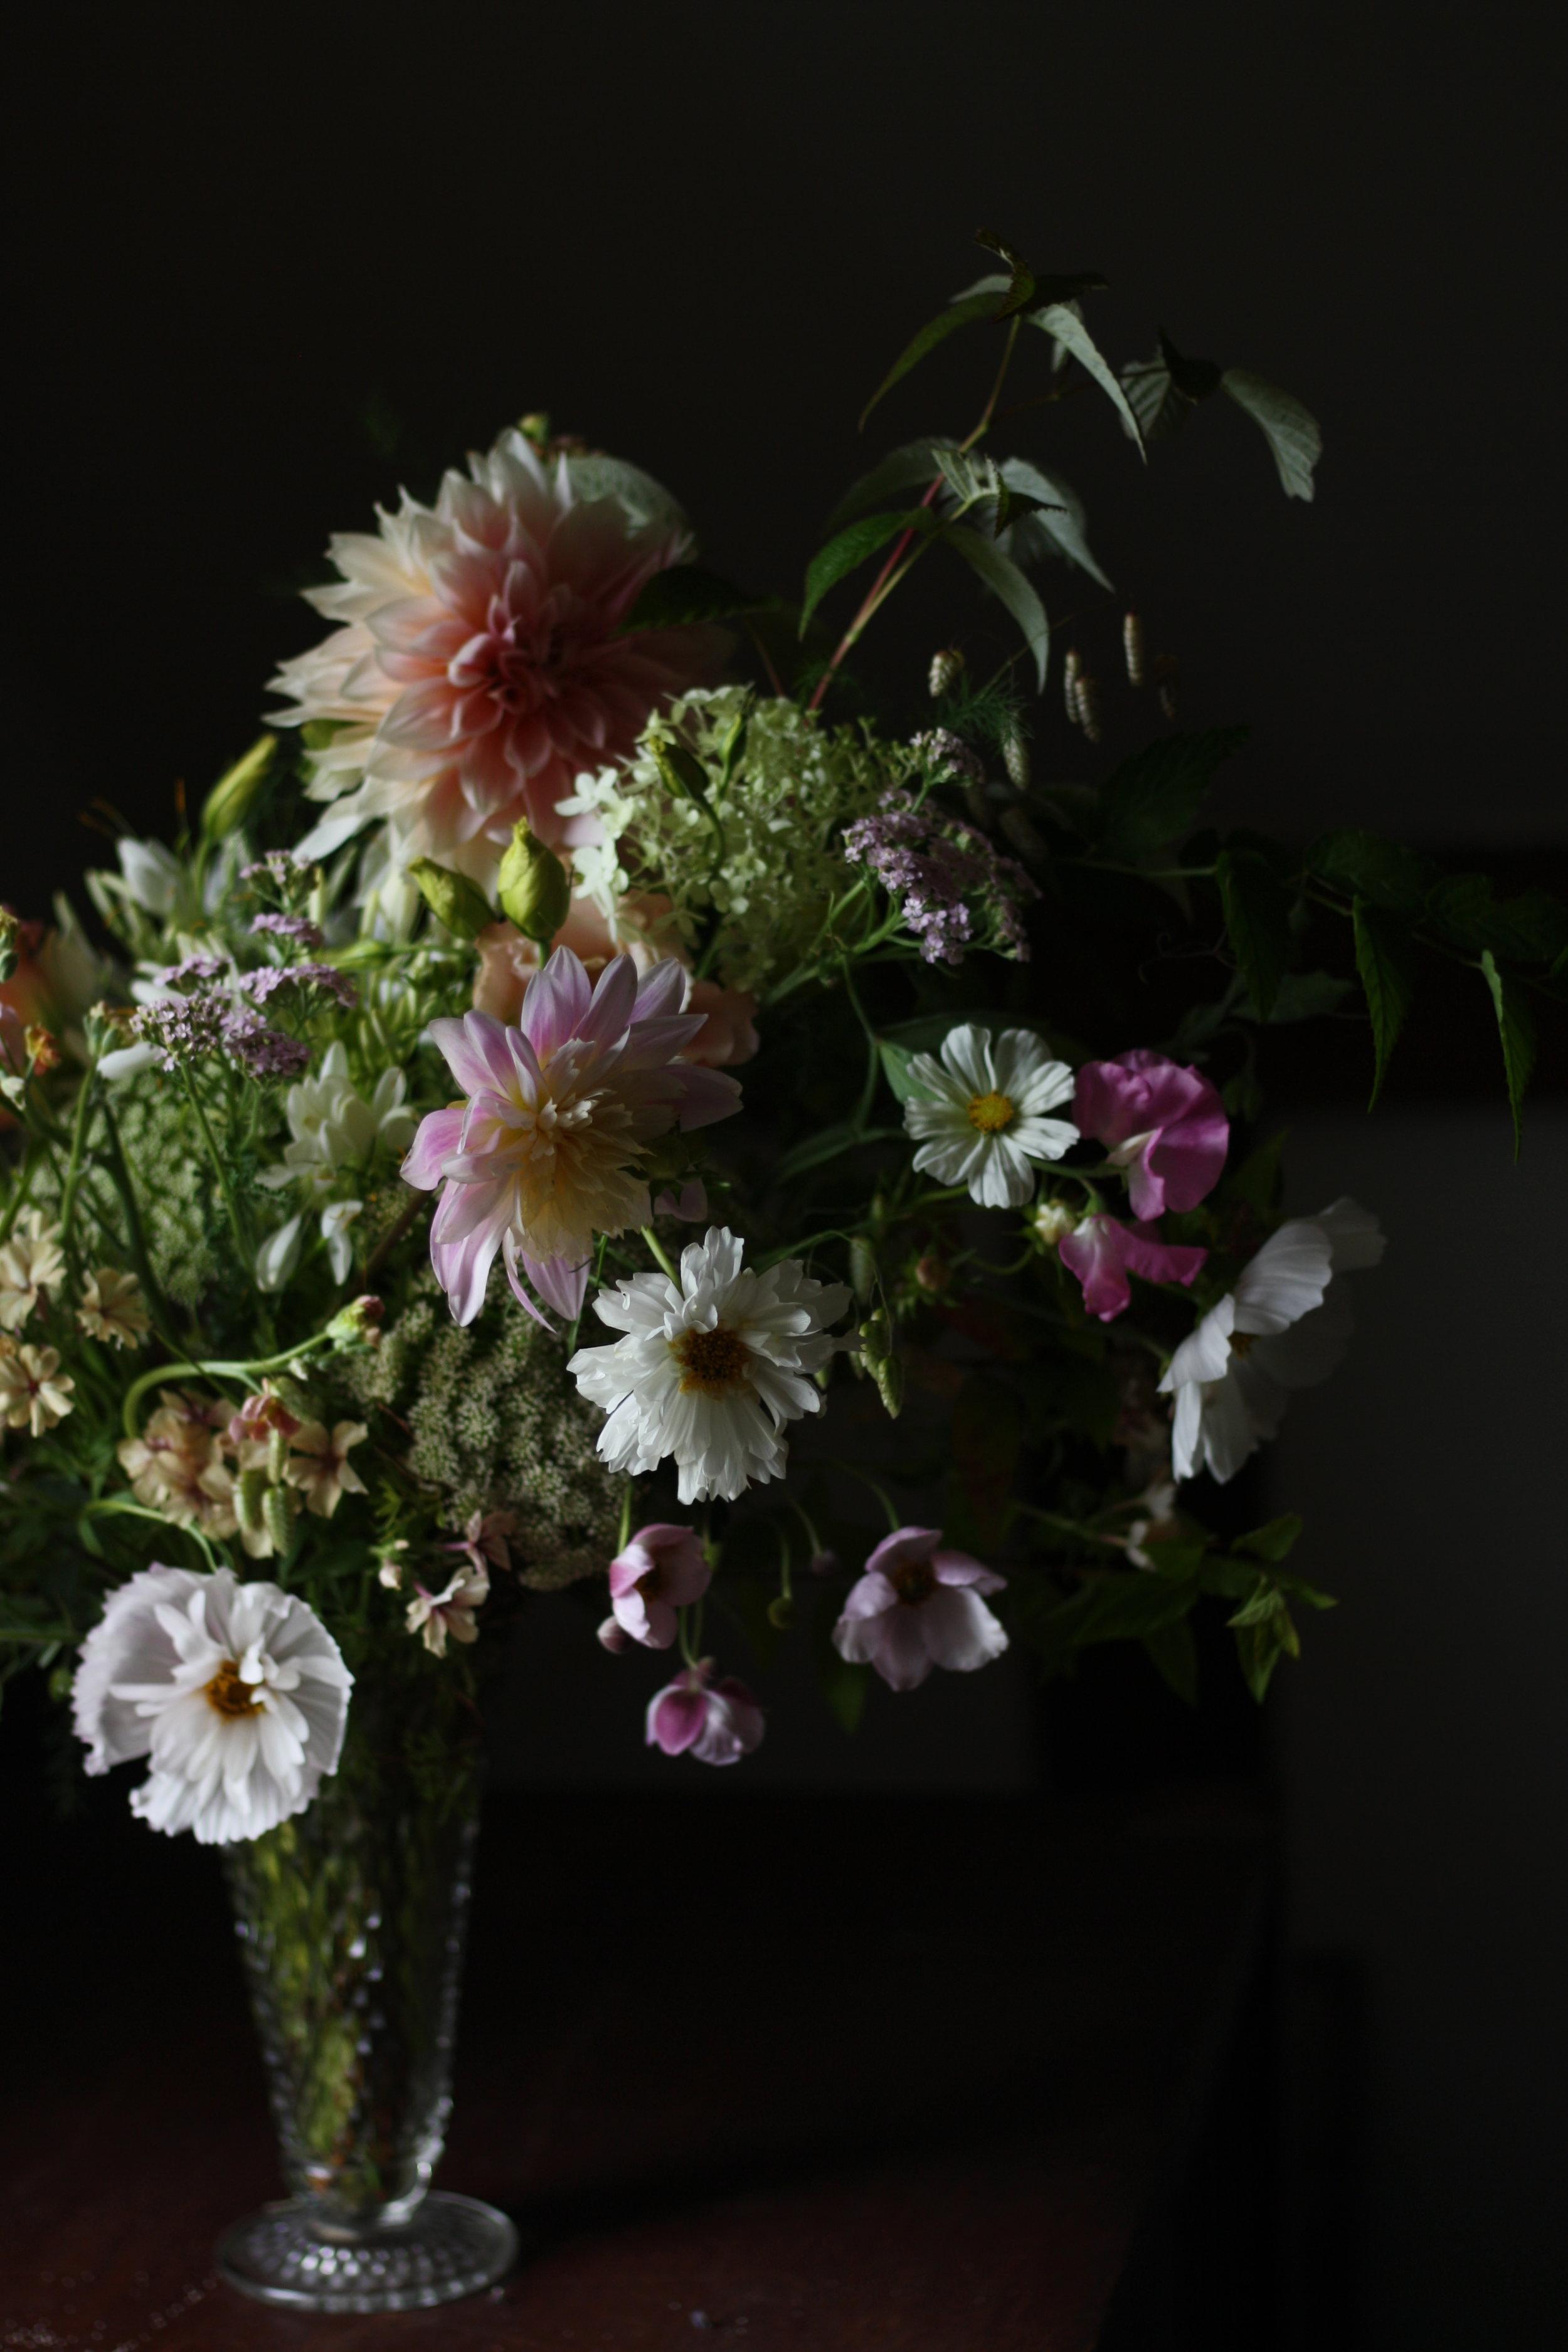 Locally grown, eco-friendly cut flowers. Nova Scotia